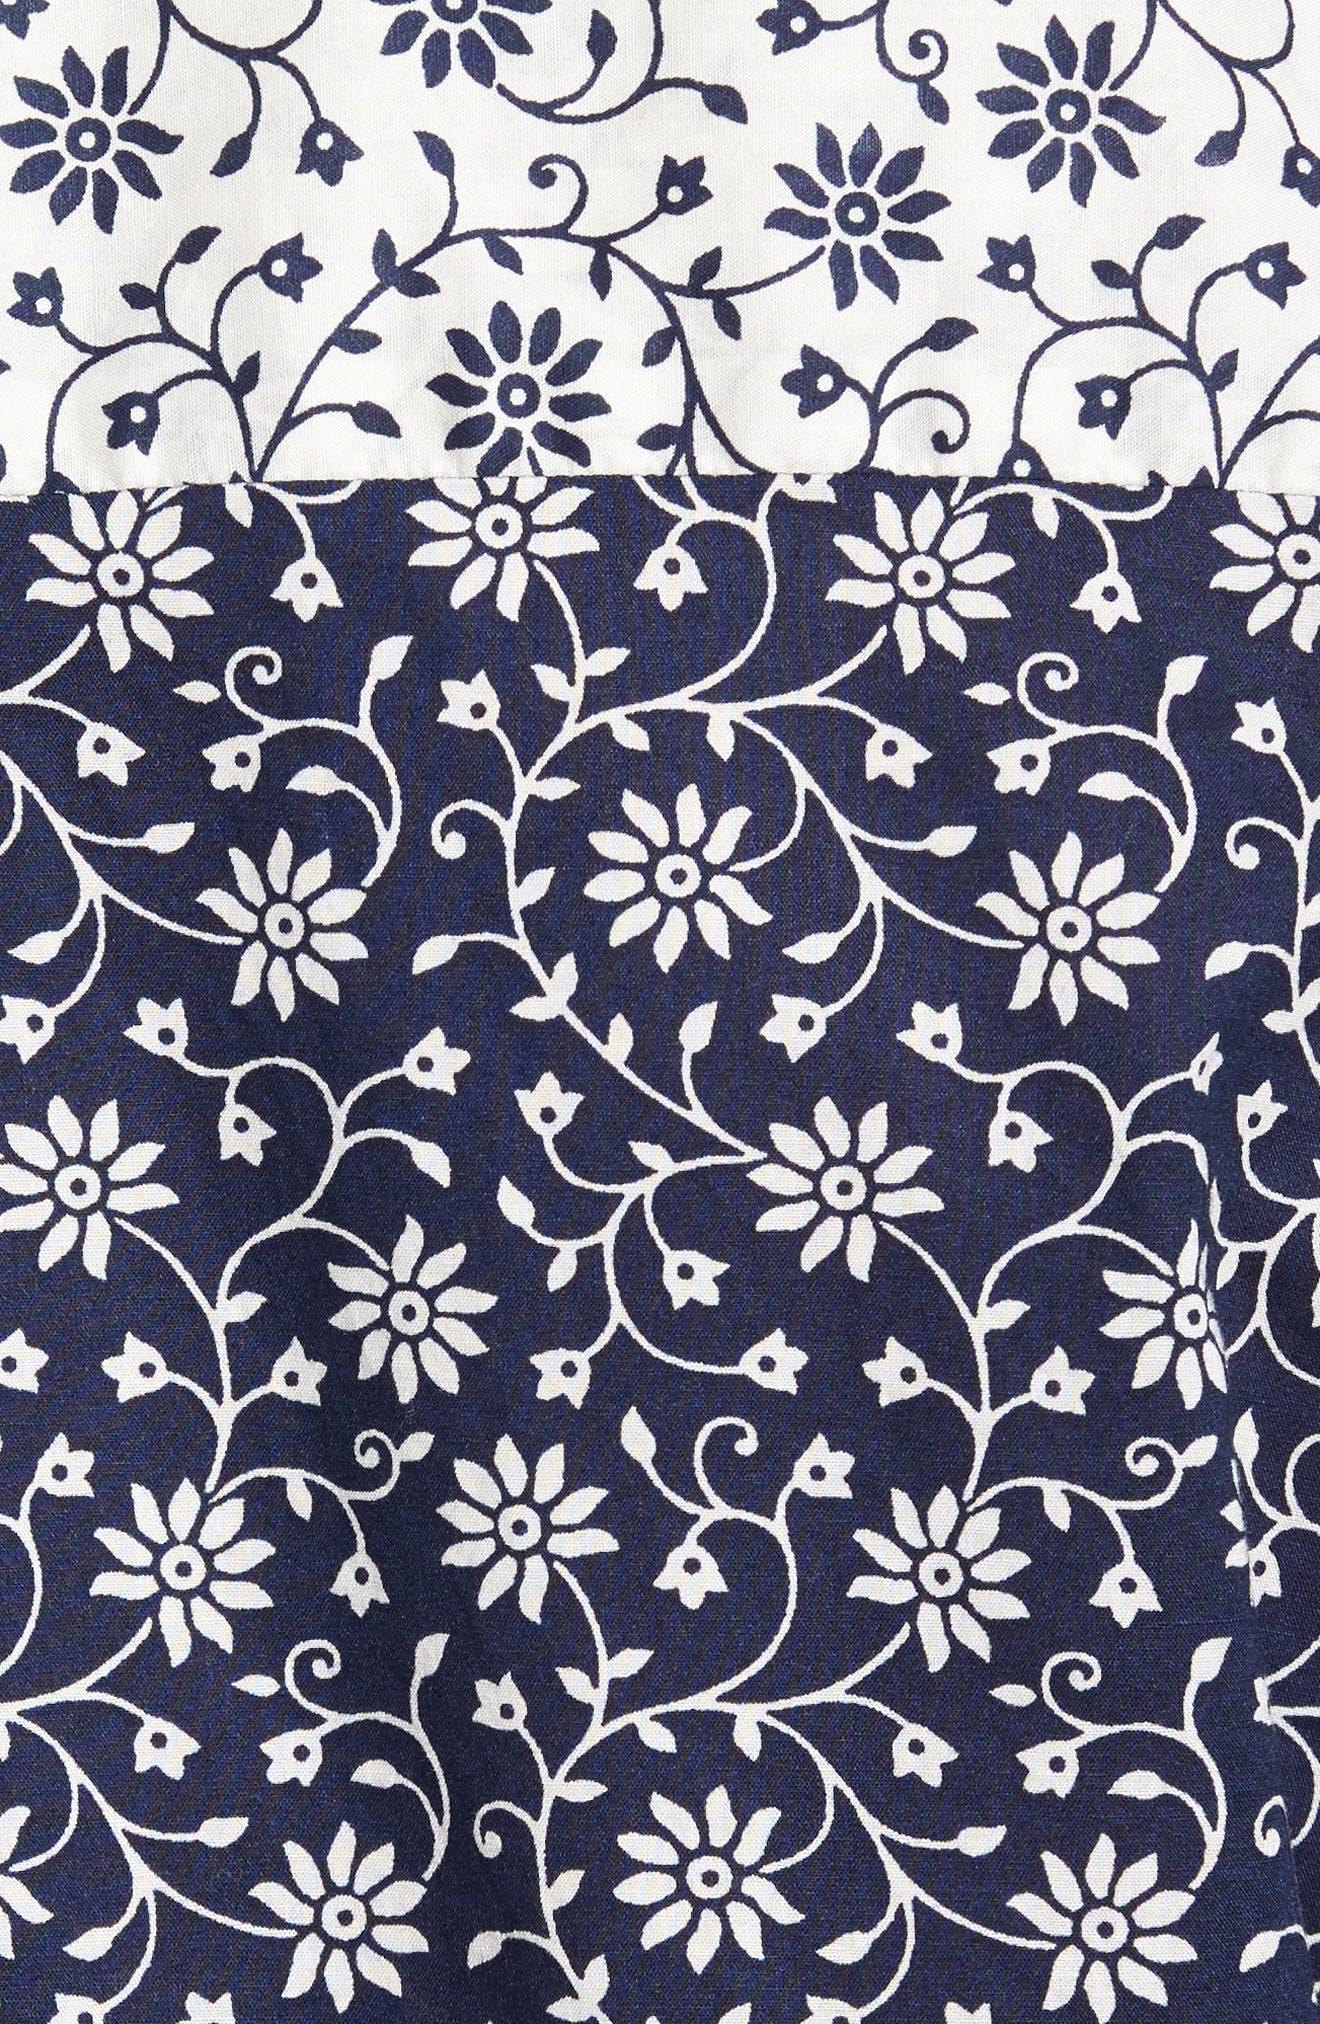 Mix & Match Print Woven Shirt,                             Alternate thumbnail 5, color,                             410